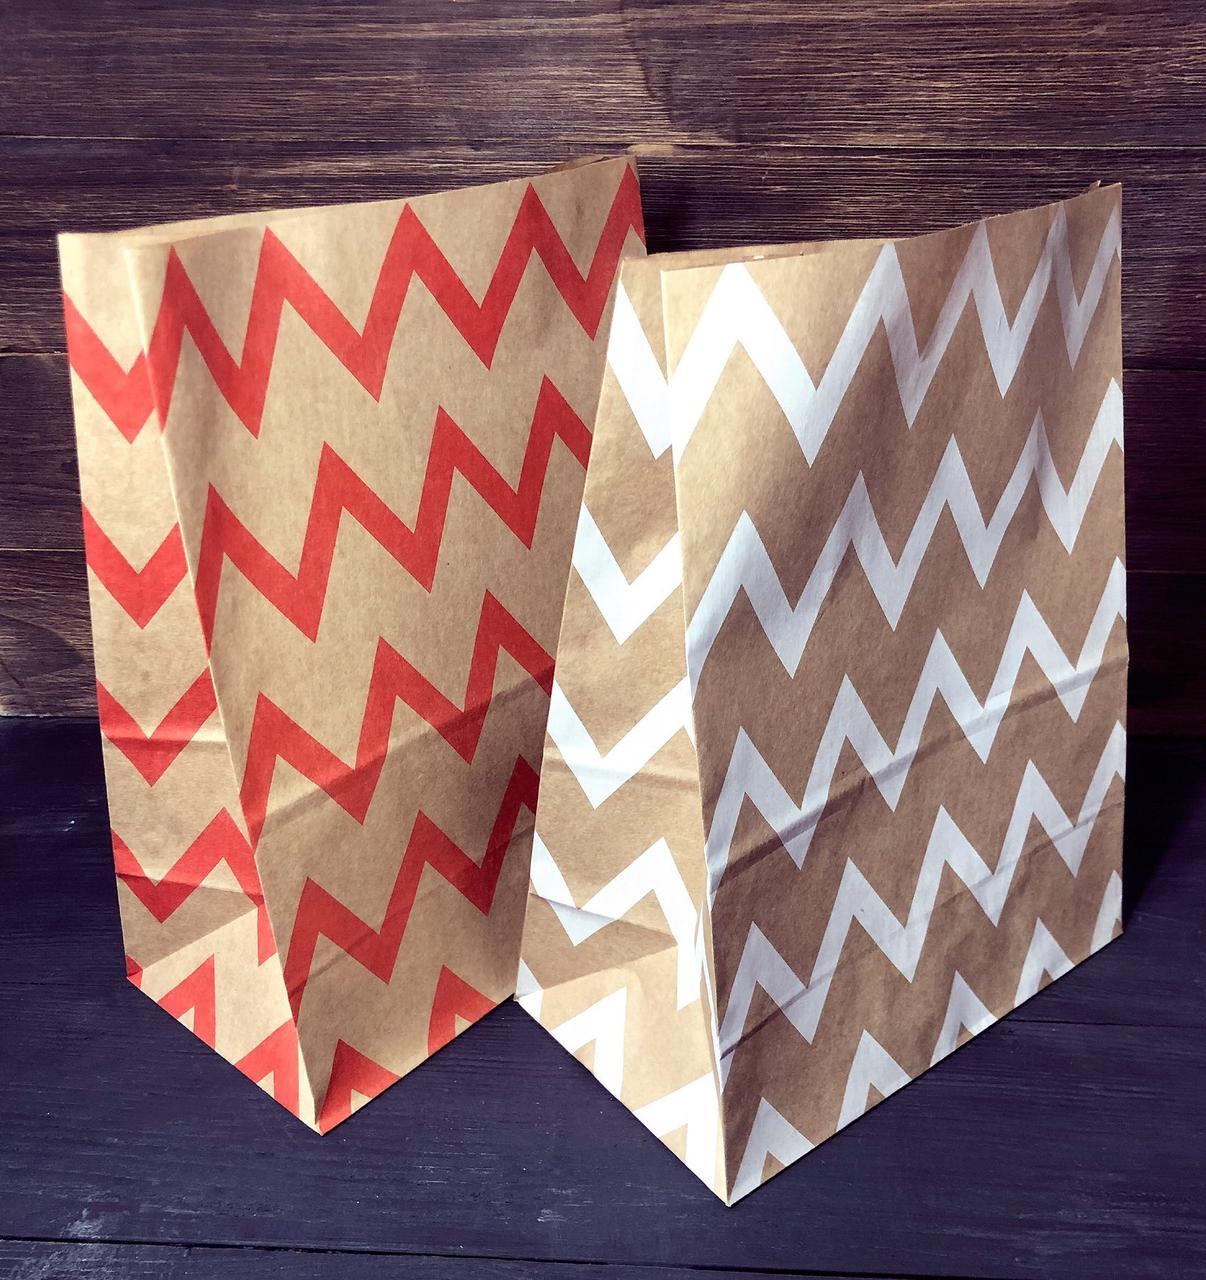 Пакет паперовий Подарунковий з малюнком орнамент 210*120*290 мм, упаковка 500 штук